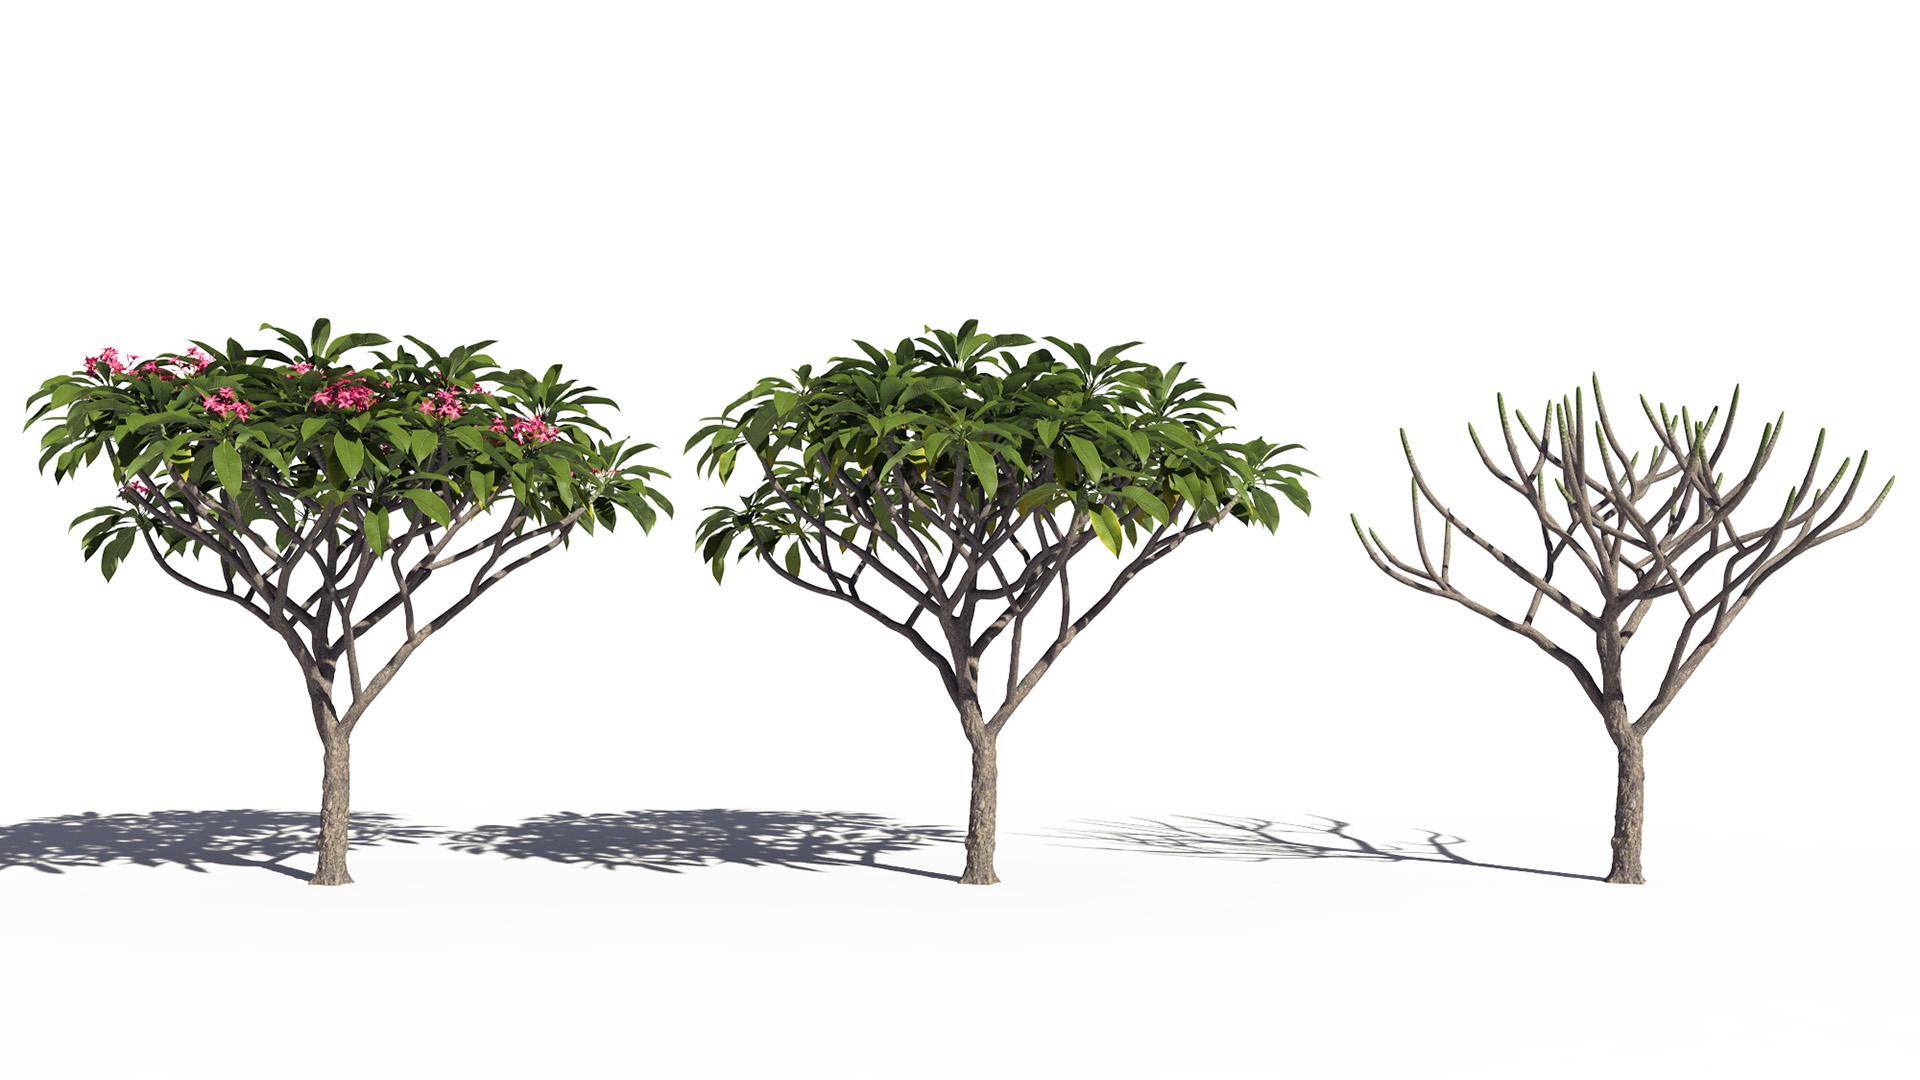 3D model of the Frangipani tree Plumeria rubra pink season variations